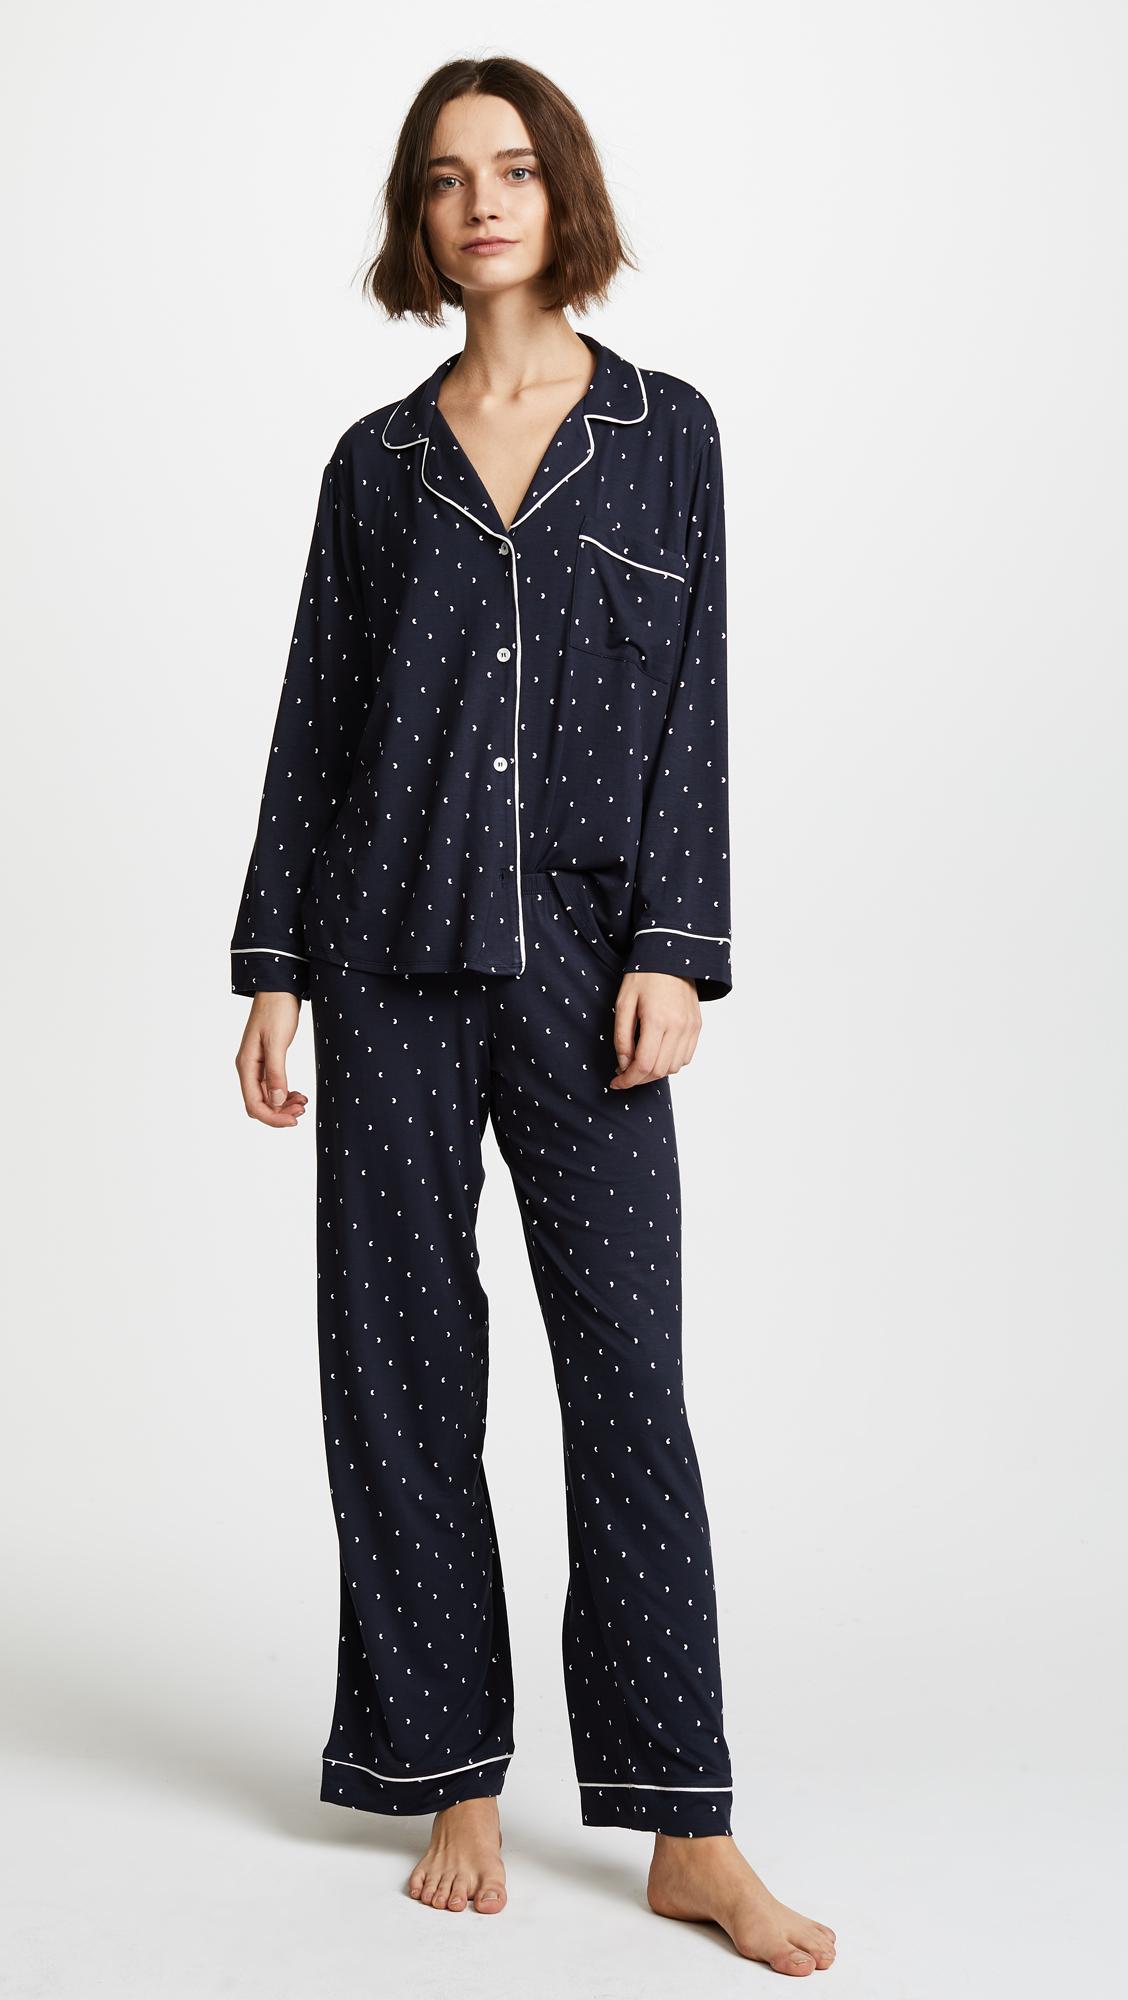 pyjama, nuit, dormir